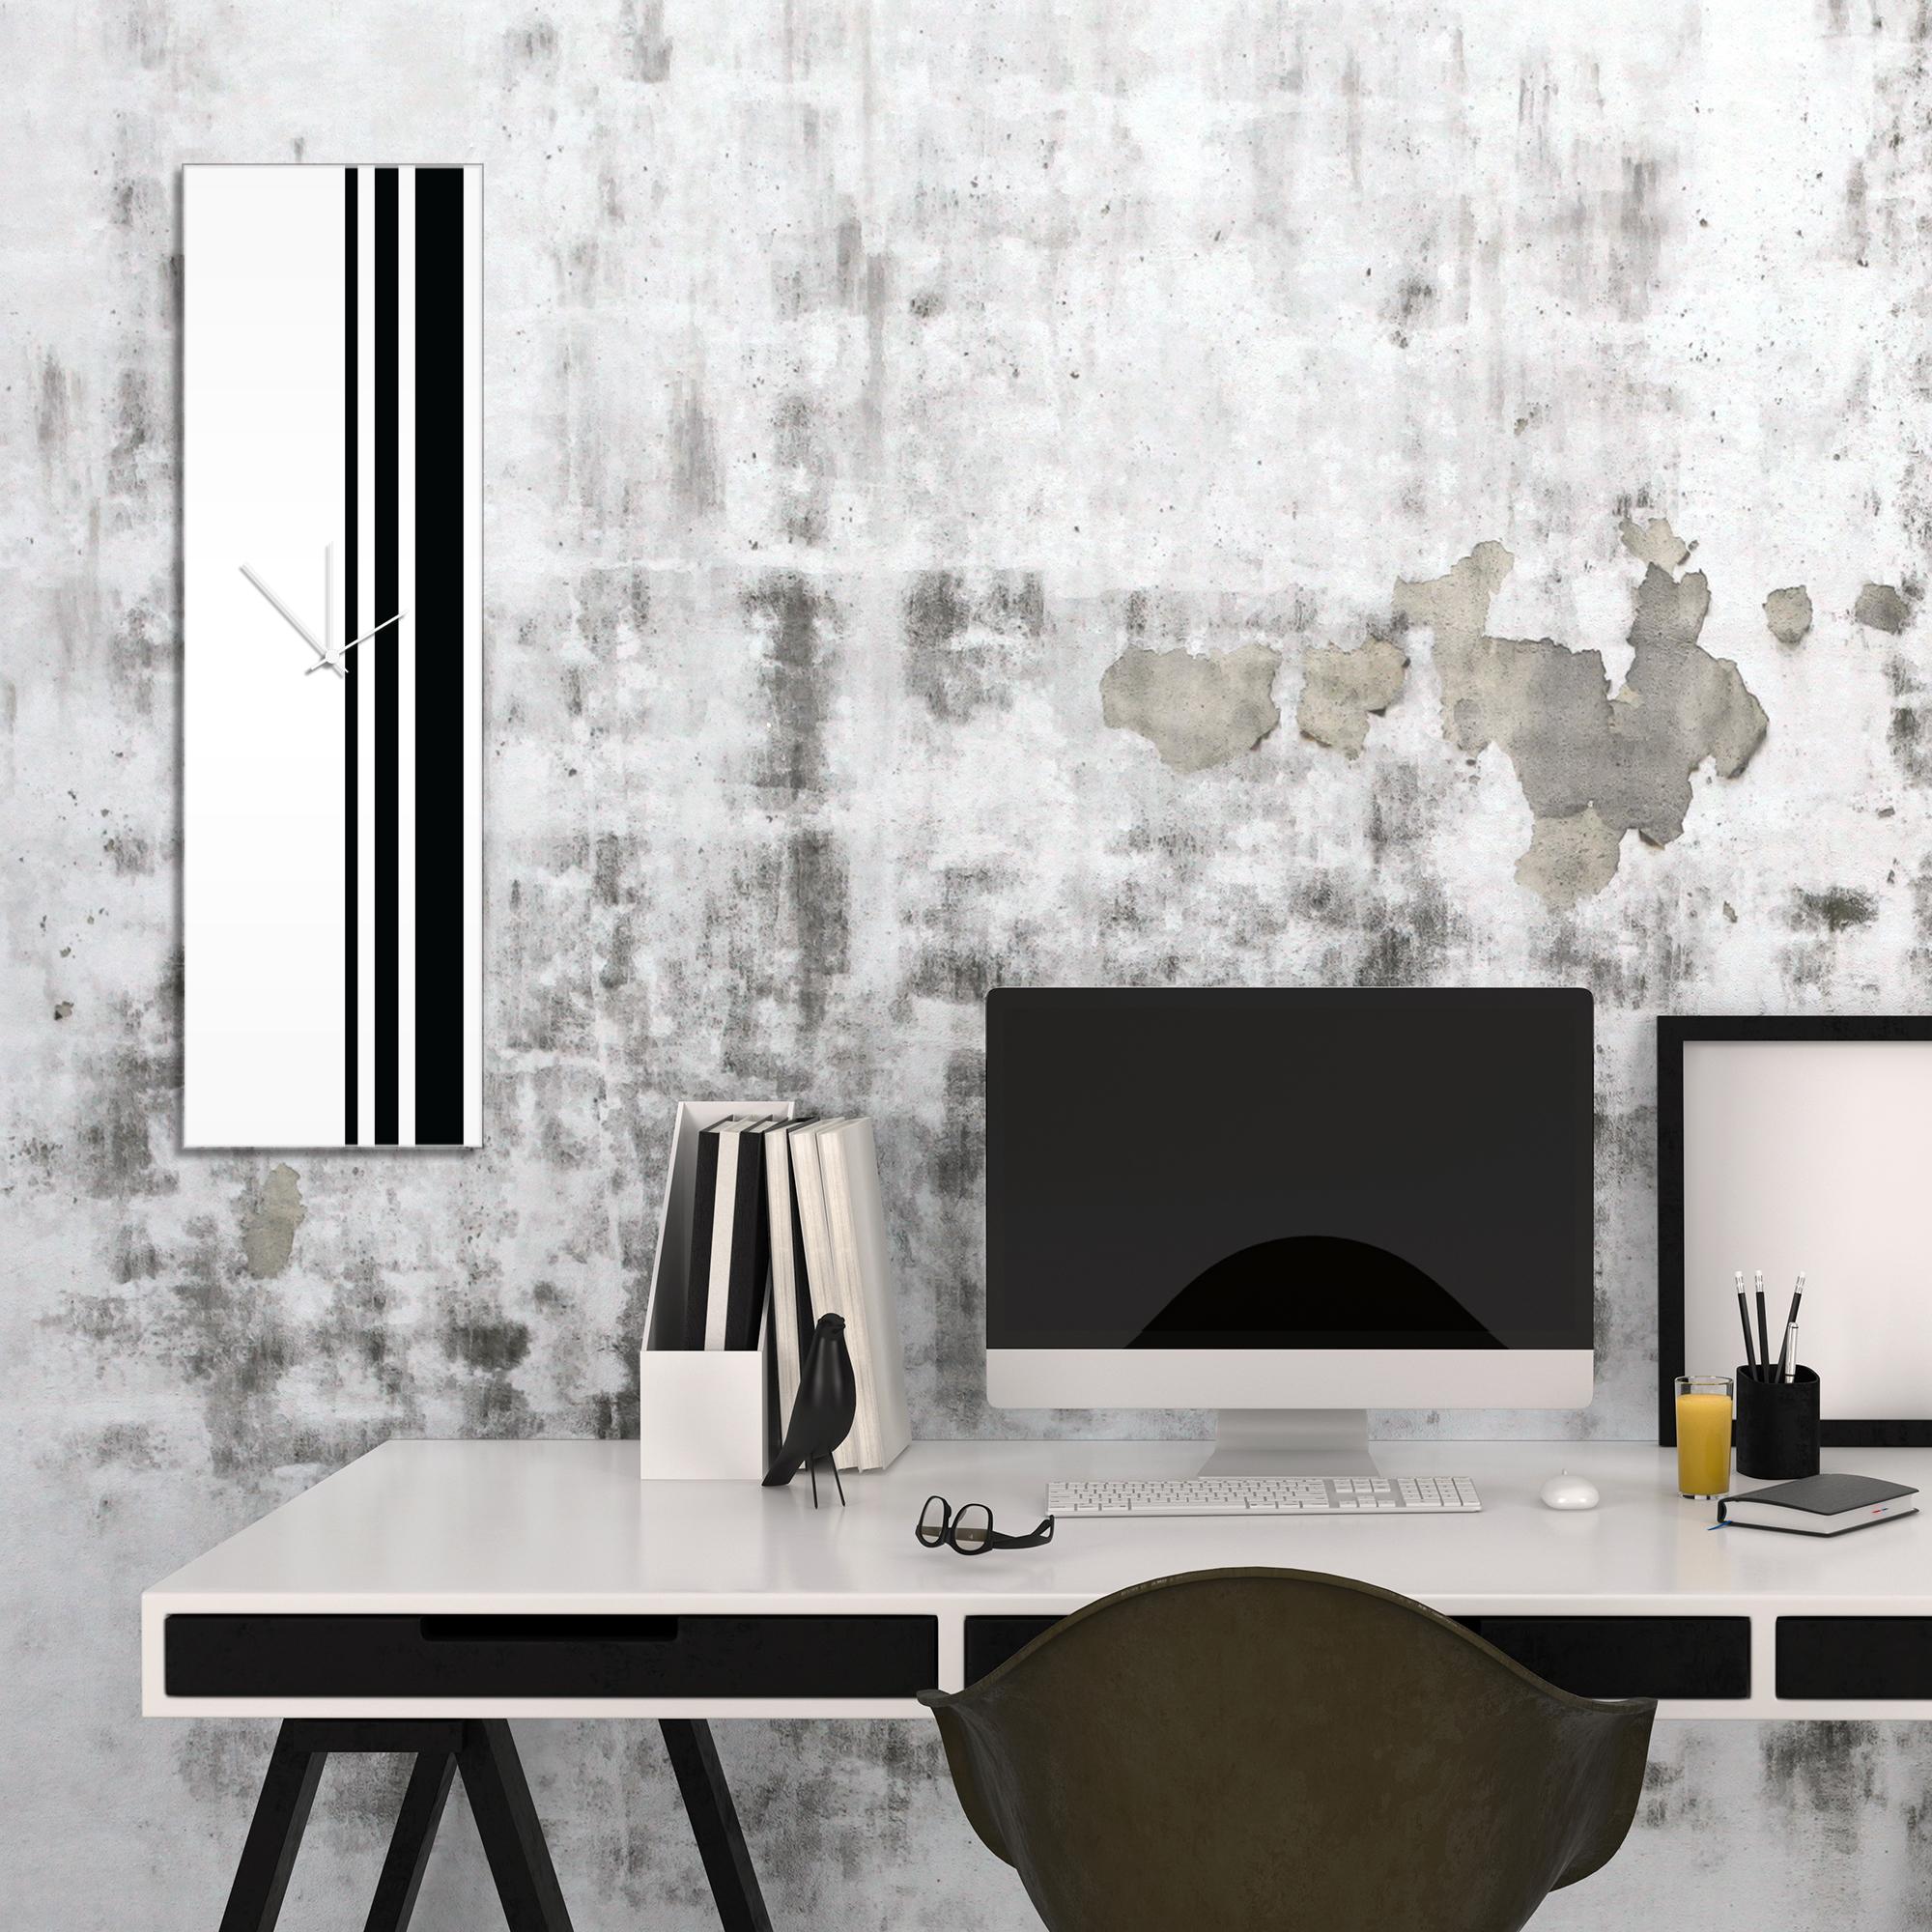 Black Triple Stripe Clock by Adam Schwoeppe Large Modern Clock on Acrylic - Alternate View 1